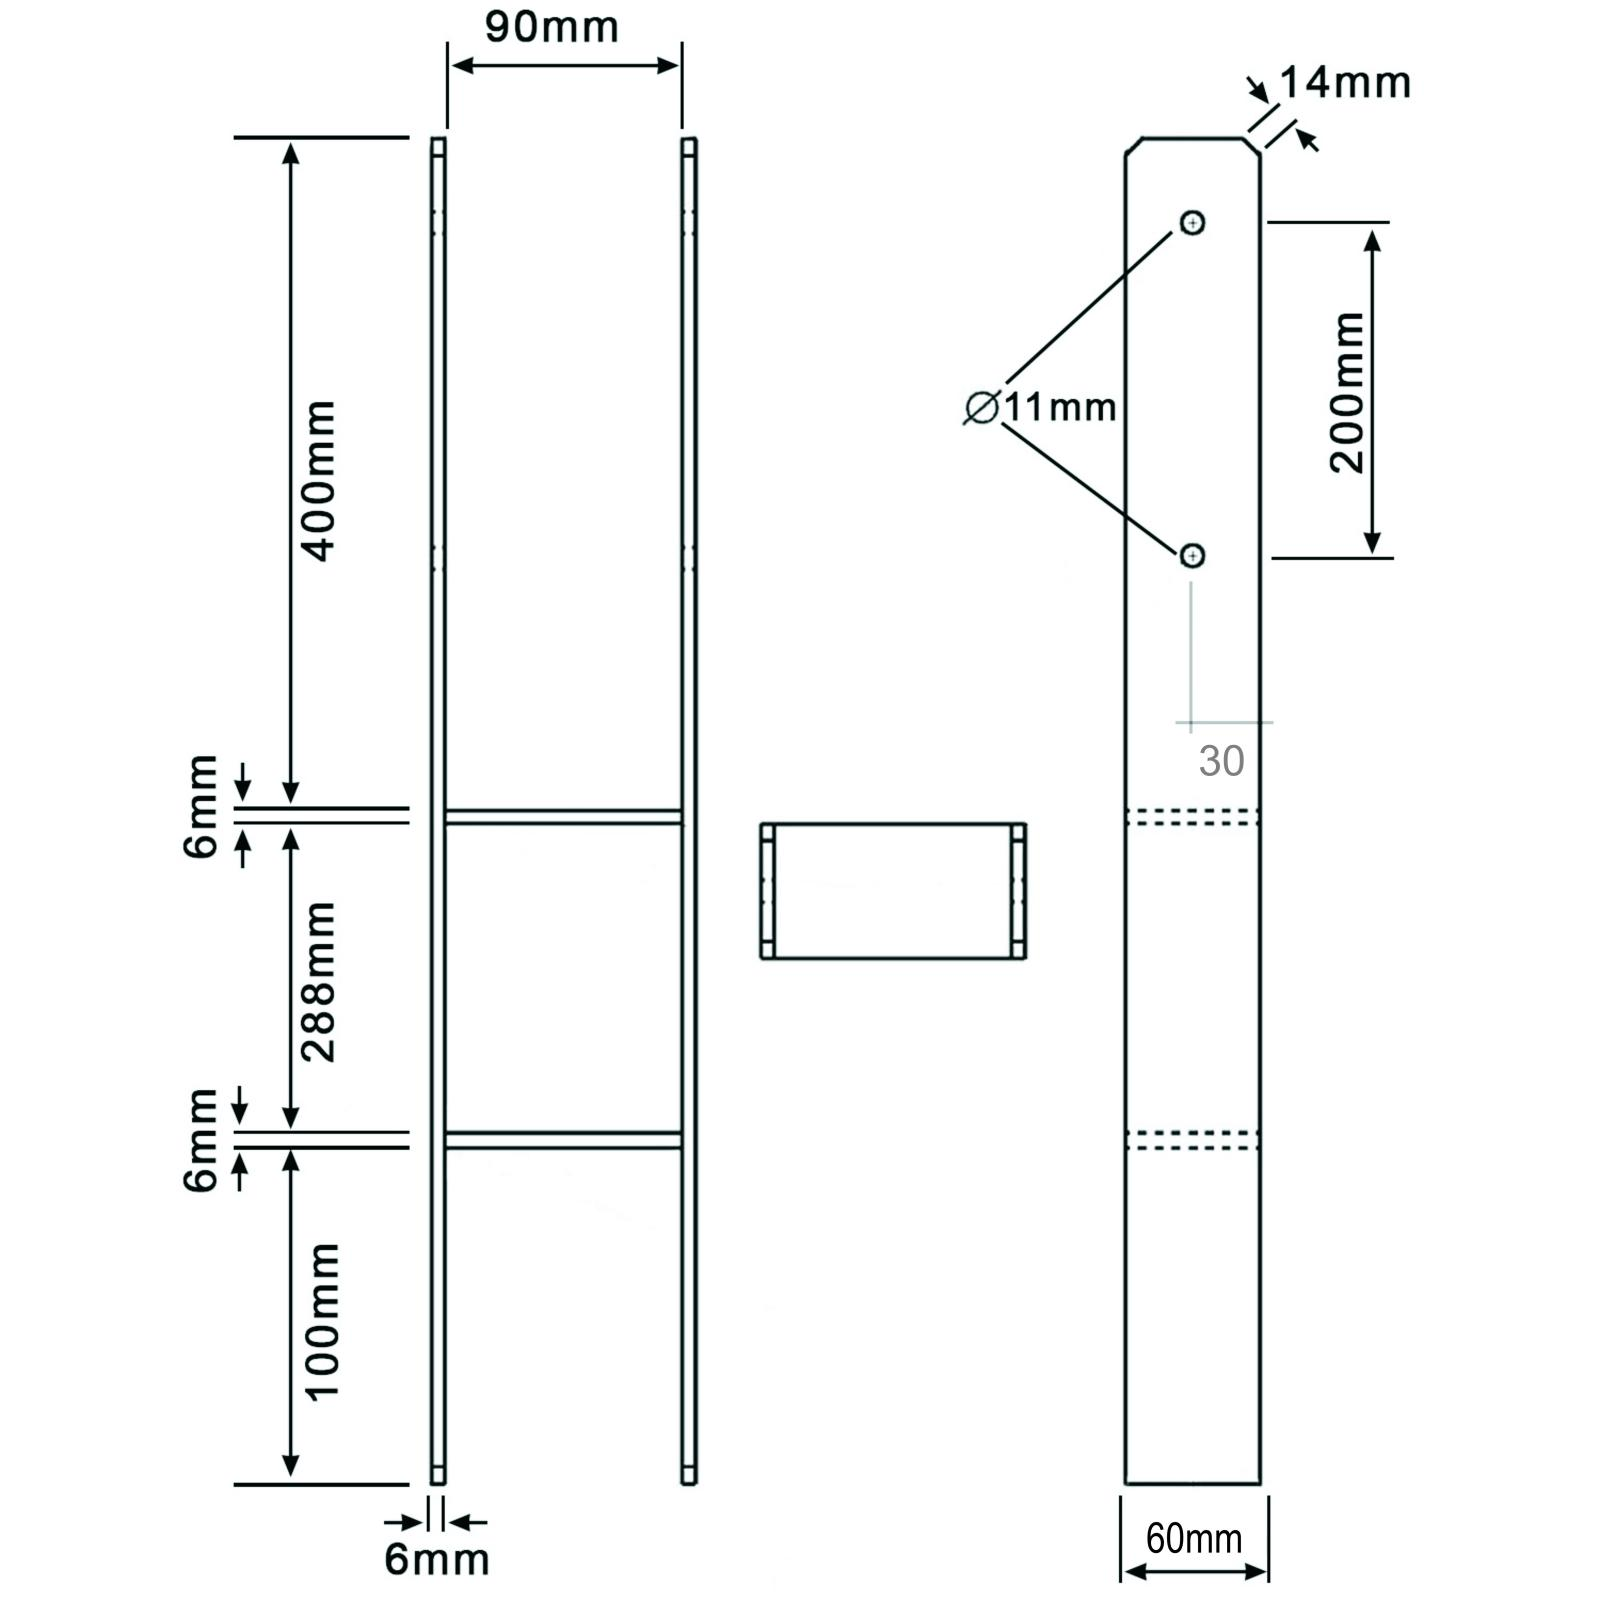 extra lang 1 H-Pfostentr/äger feuerverzinkt 6//800 mm f/ür 90 mm Pfosten